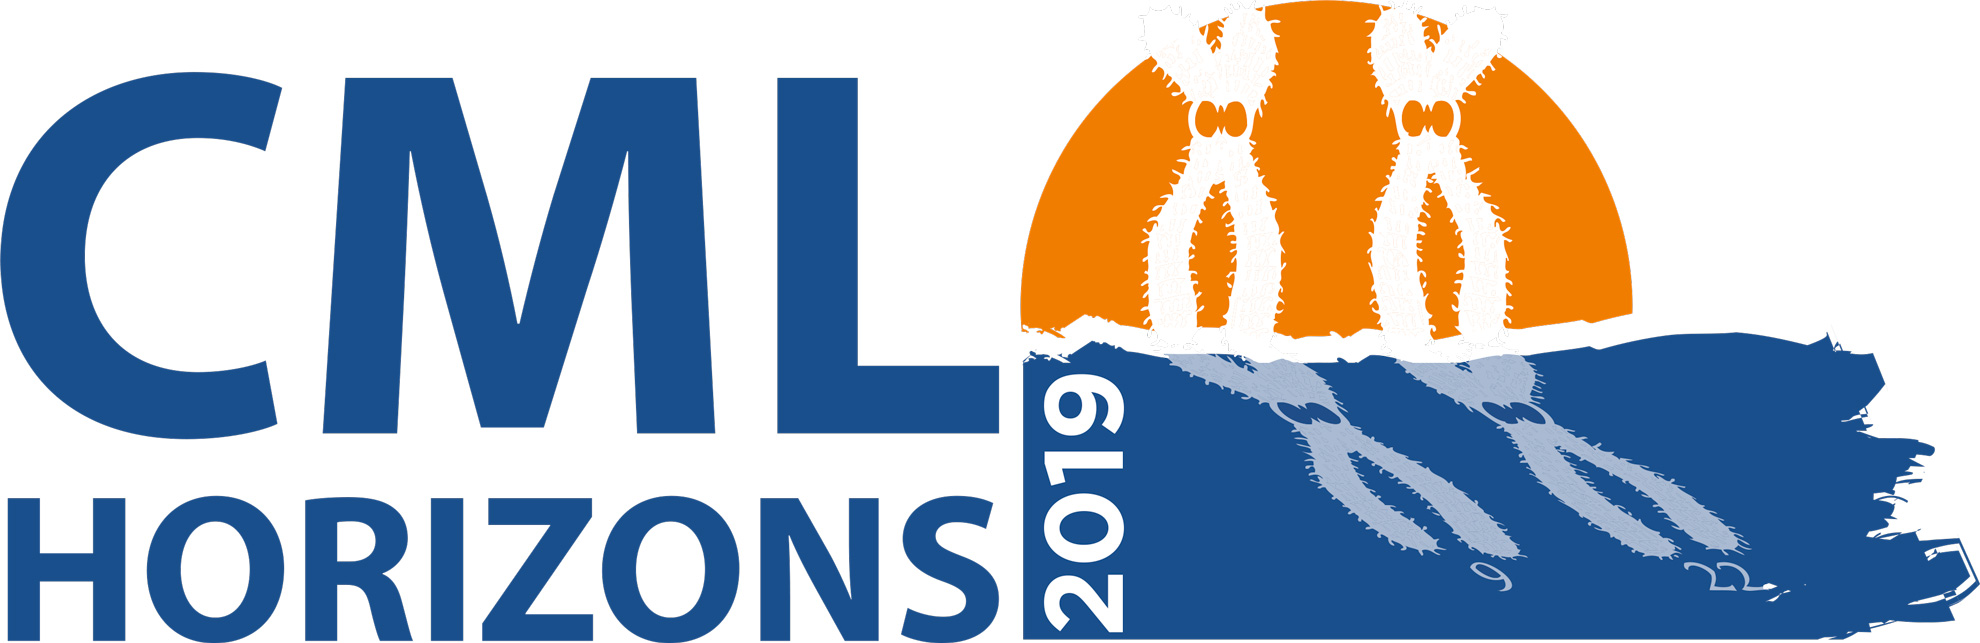 Aelemic asistirá al Congreso Mundial CML HORIZONS 2019